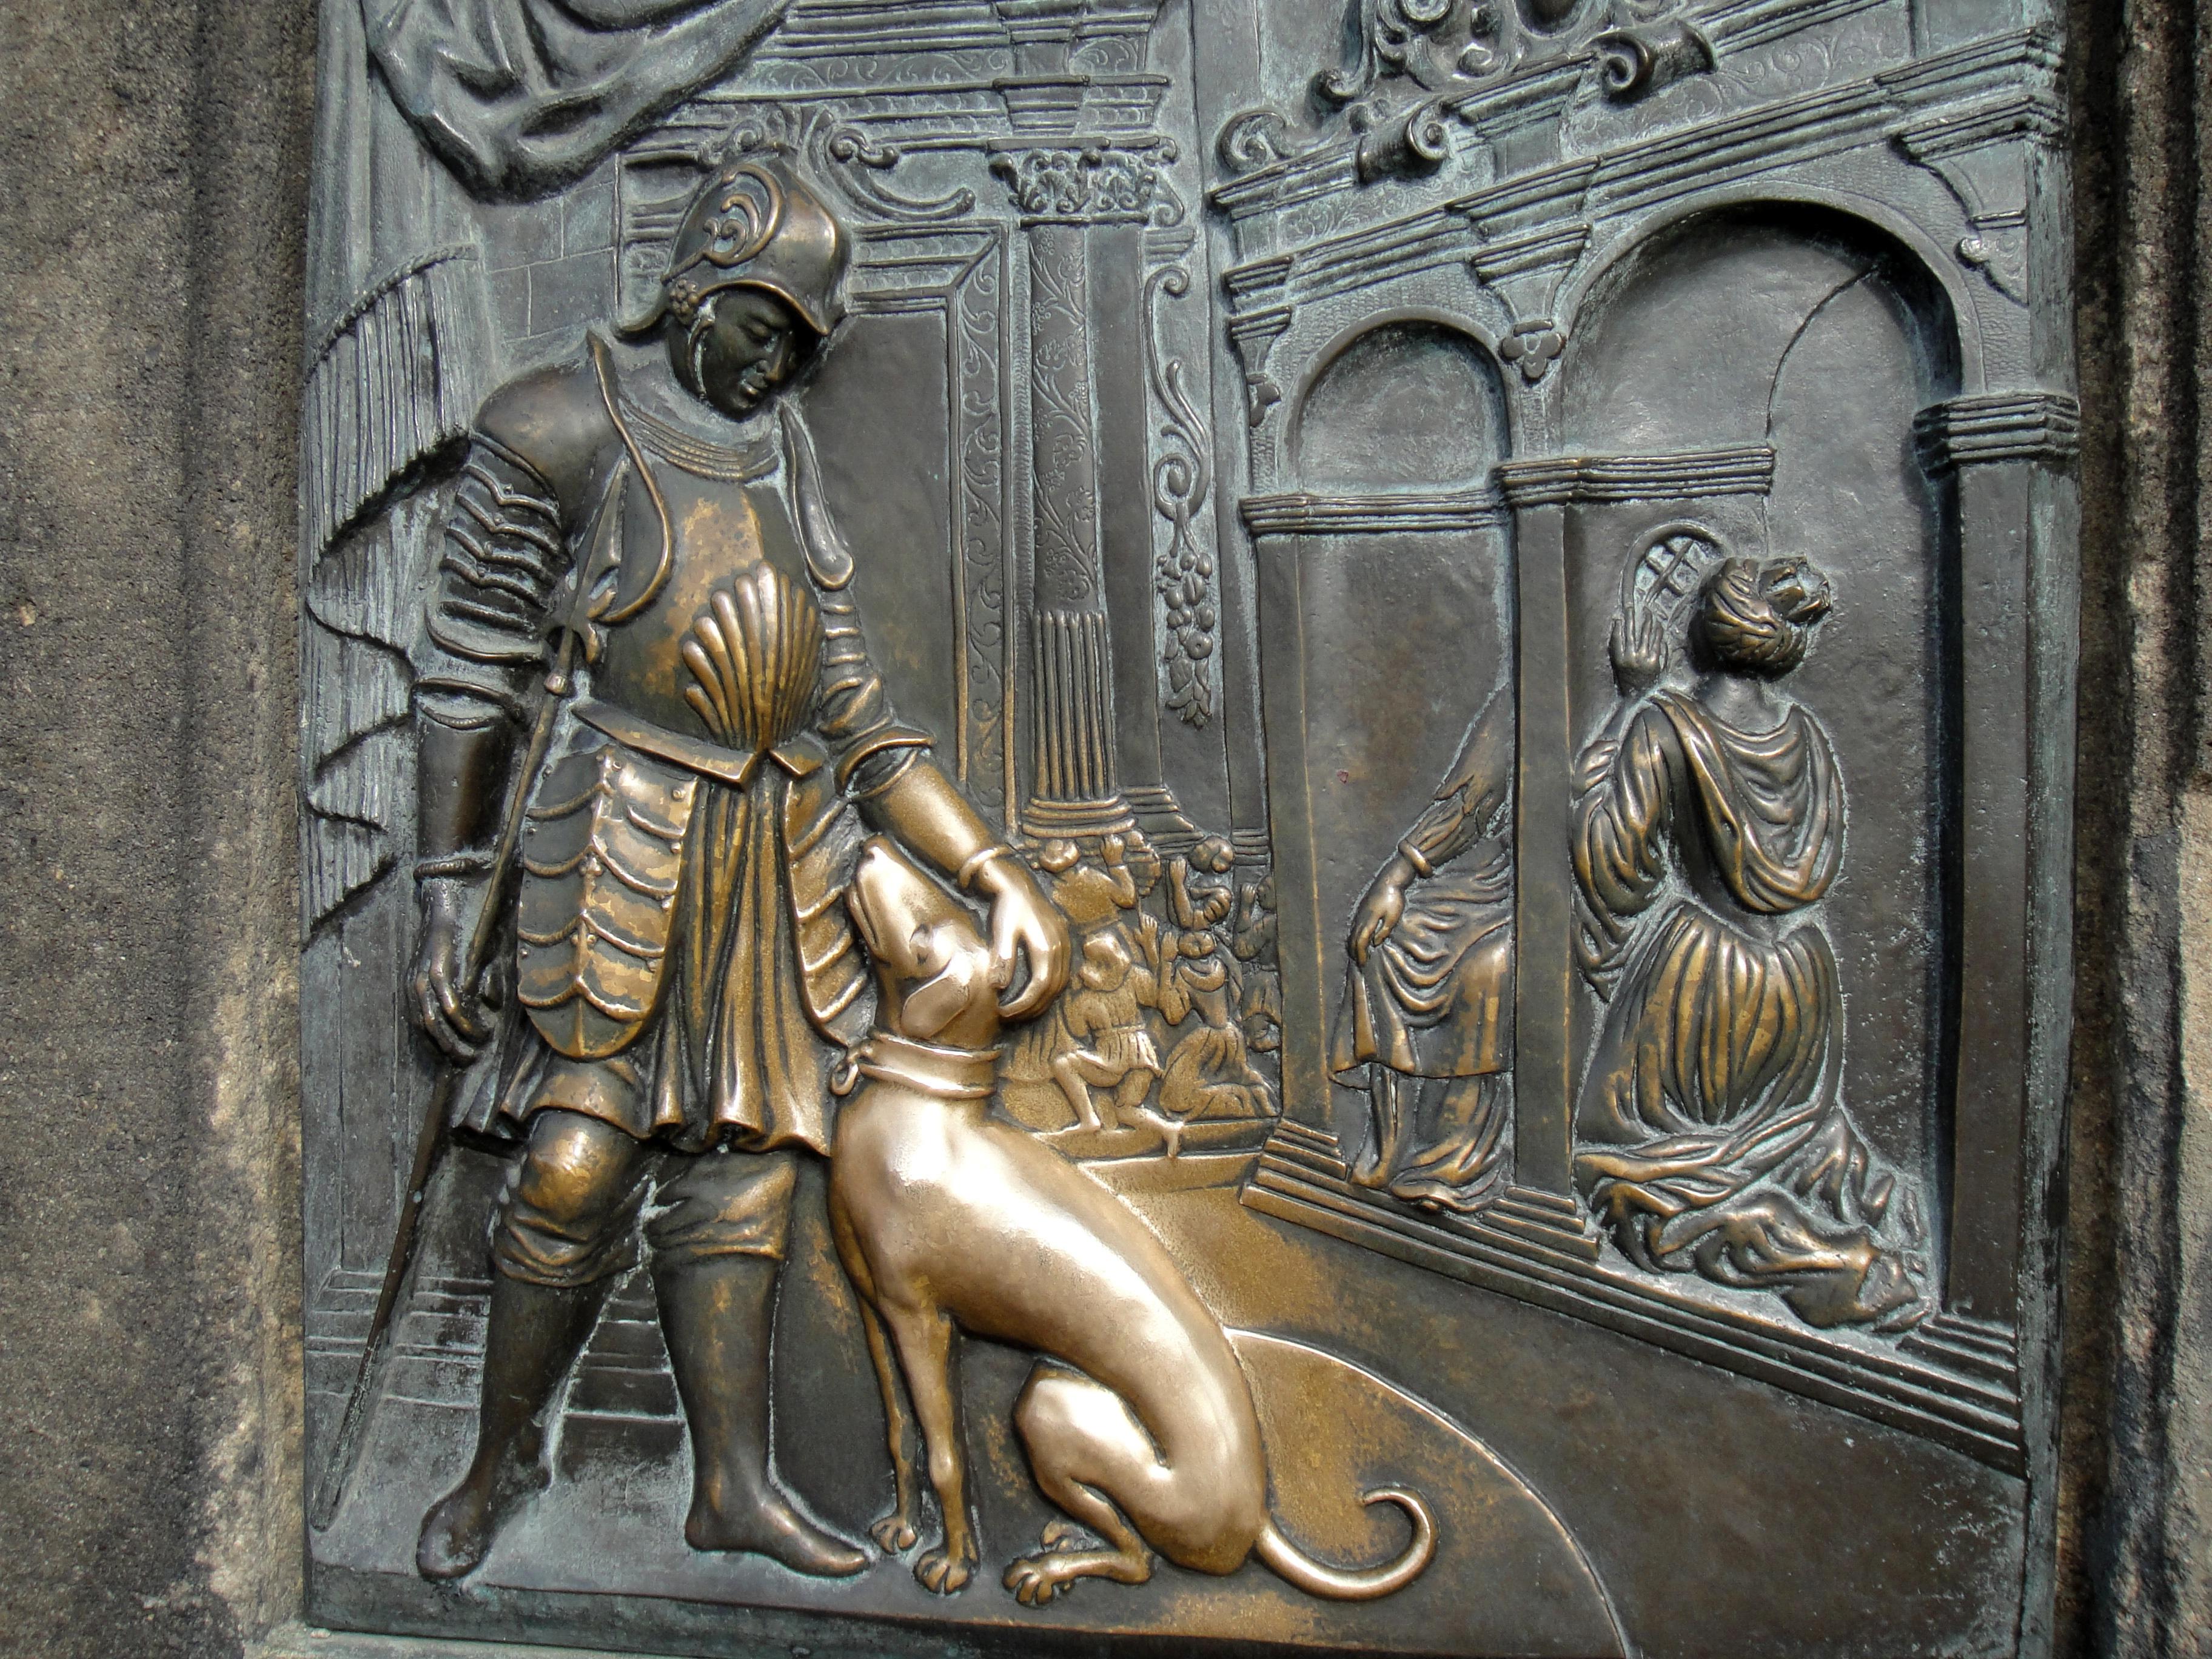 Free images monument statue metal prague sculpture